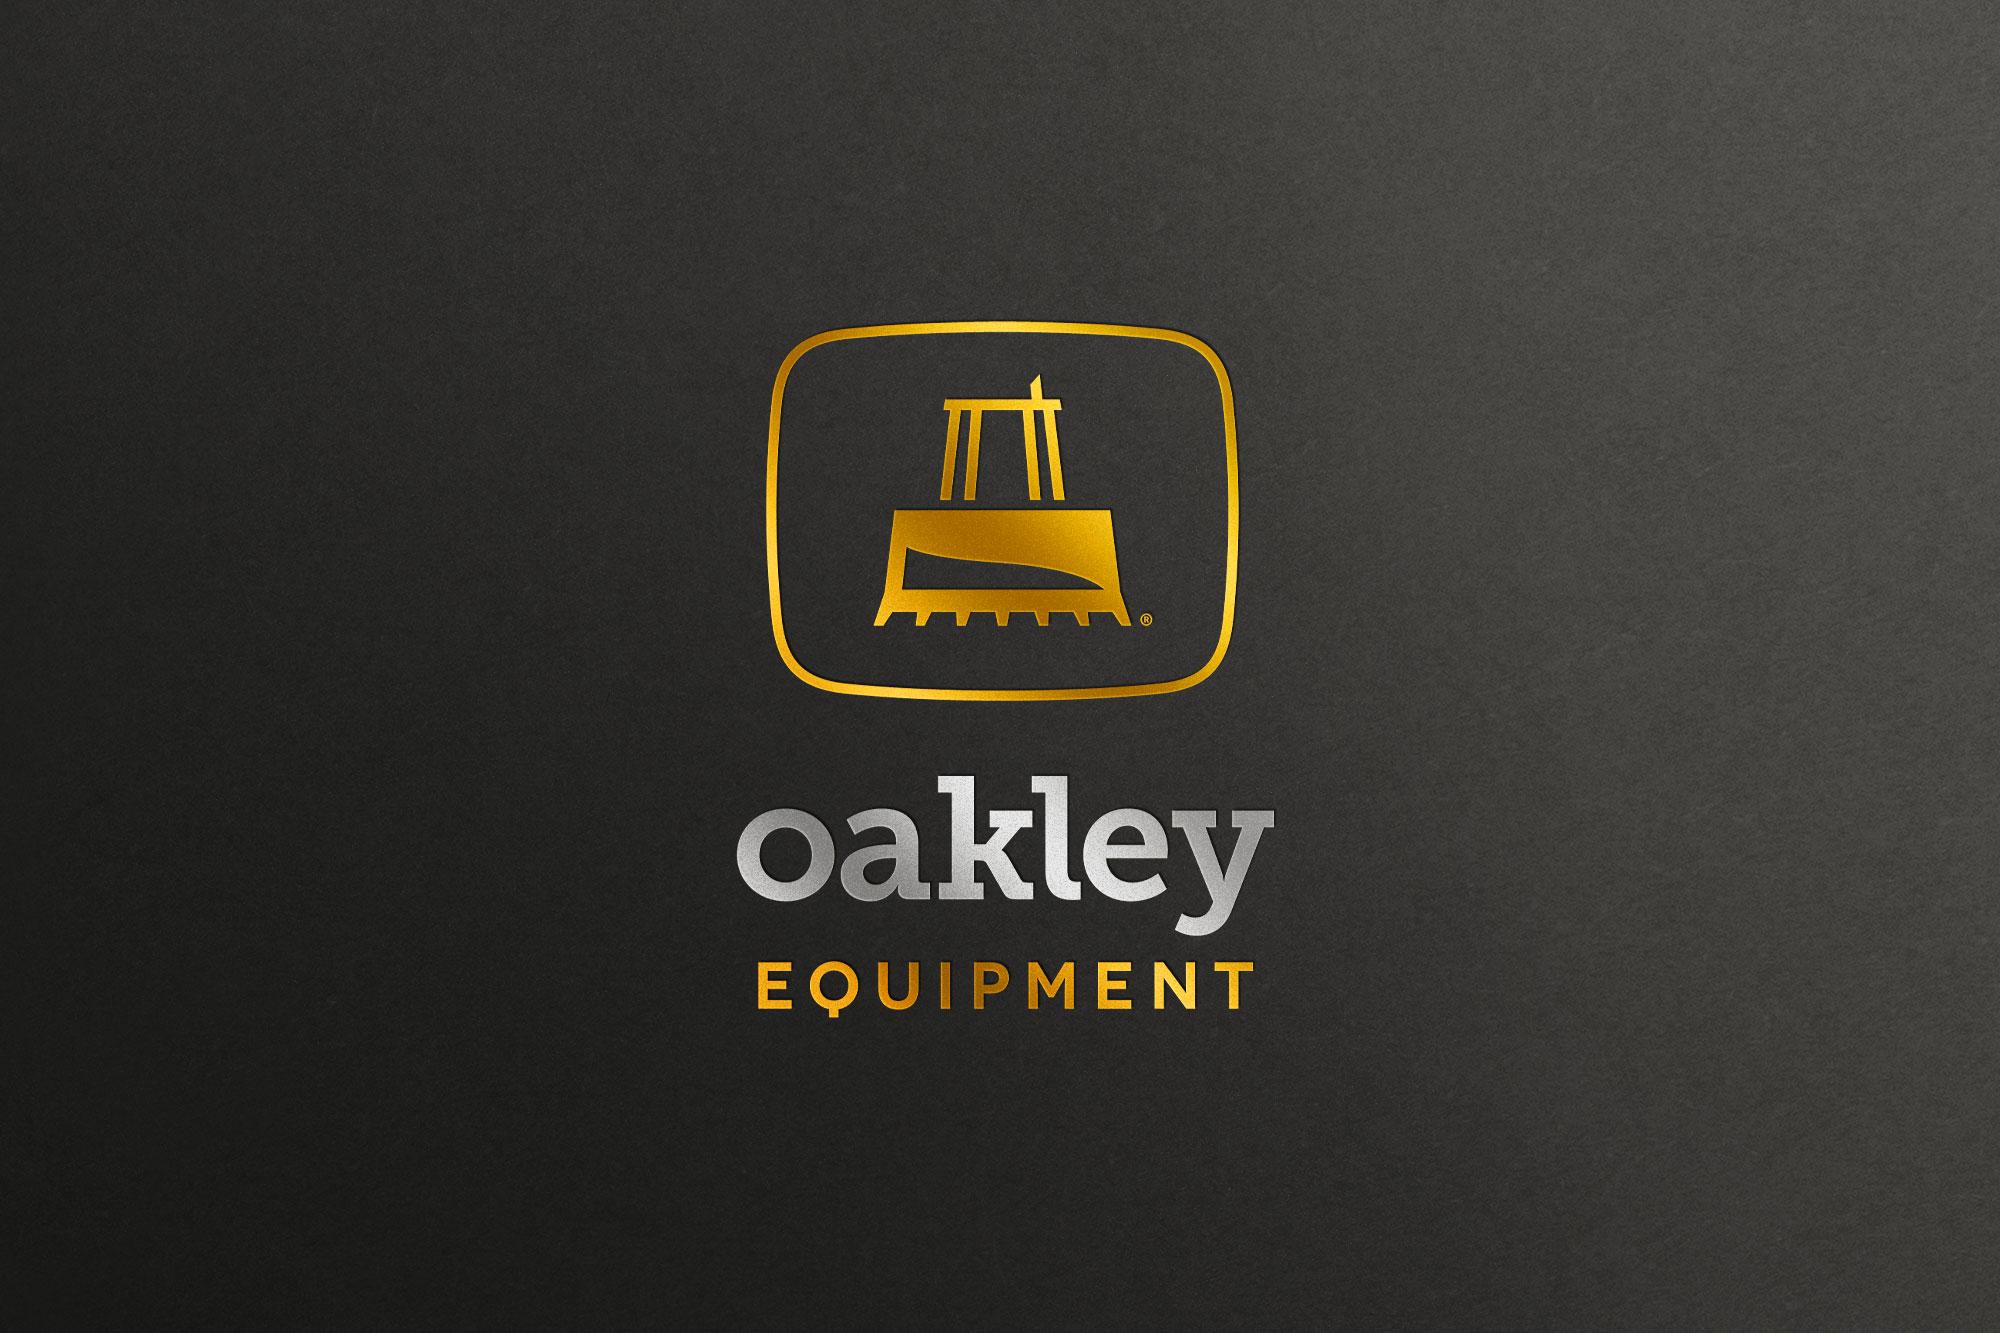 oakley equipment